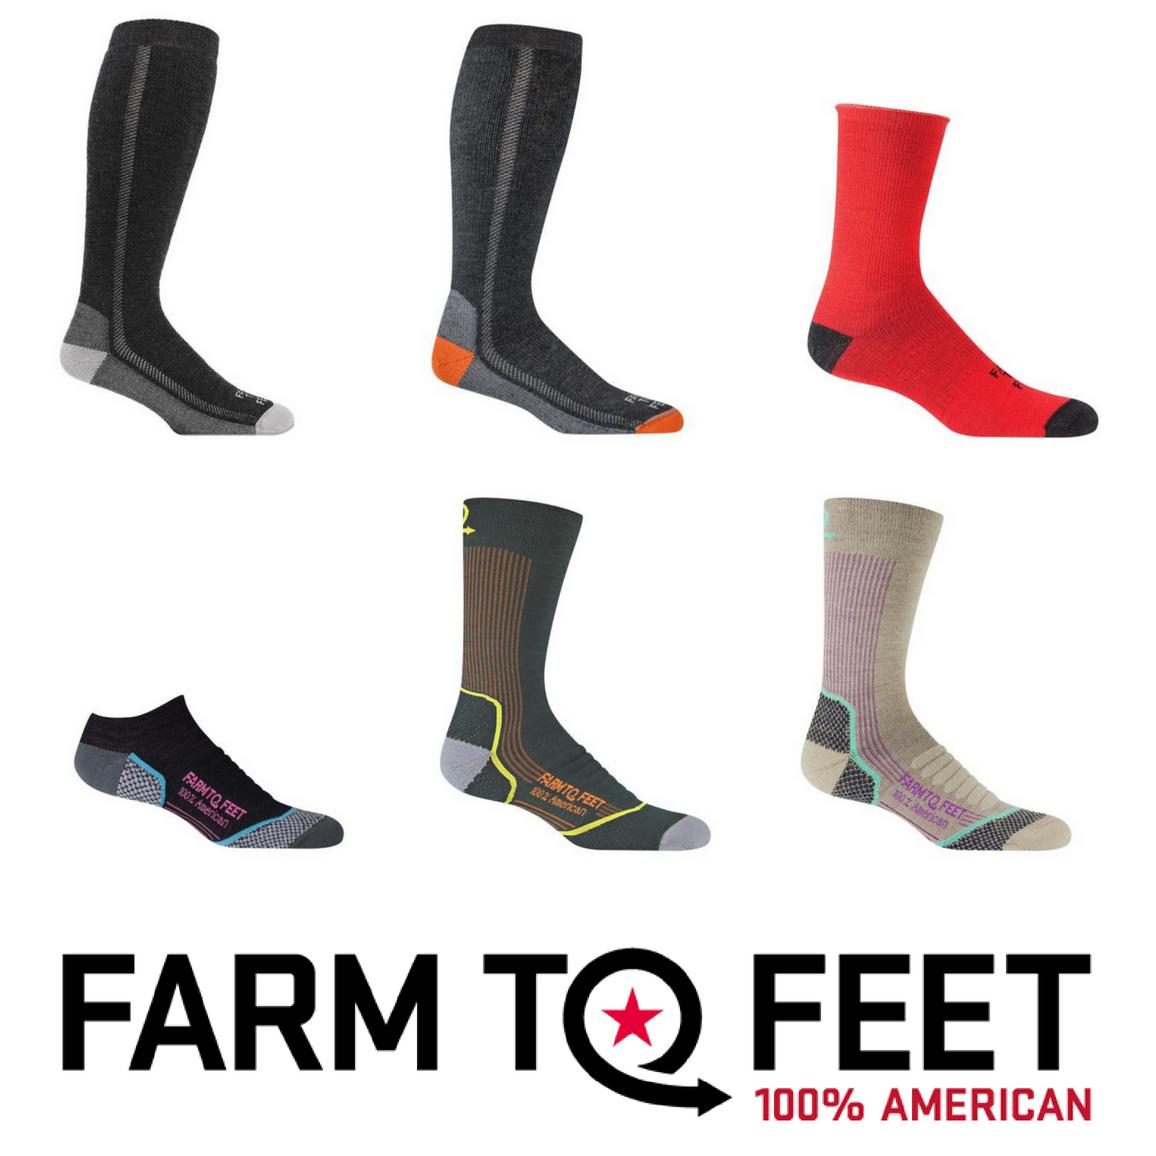 Farm to feet brand image (2).jpg